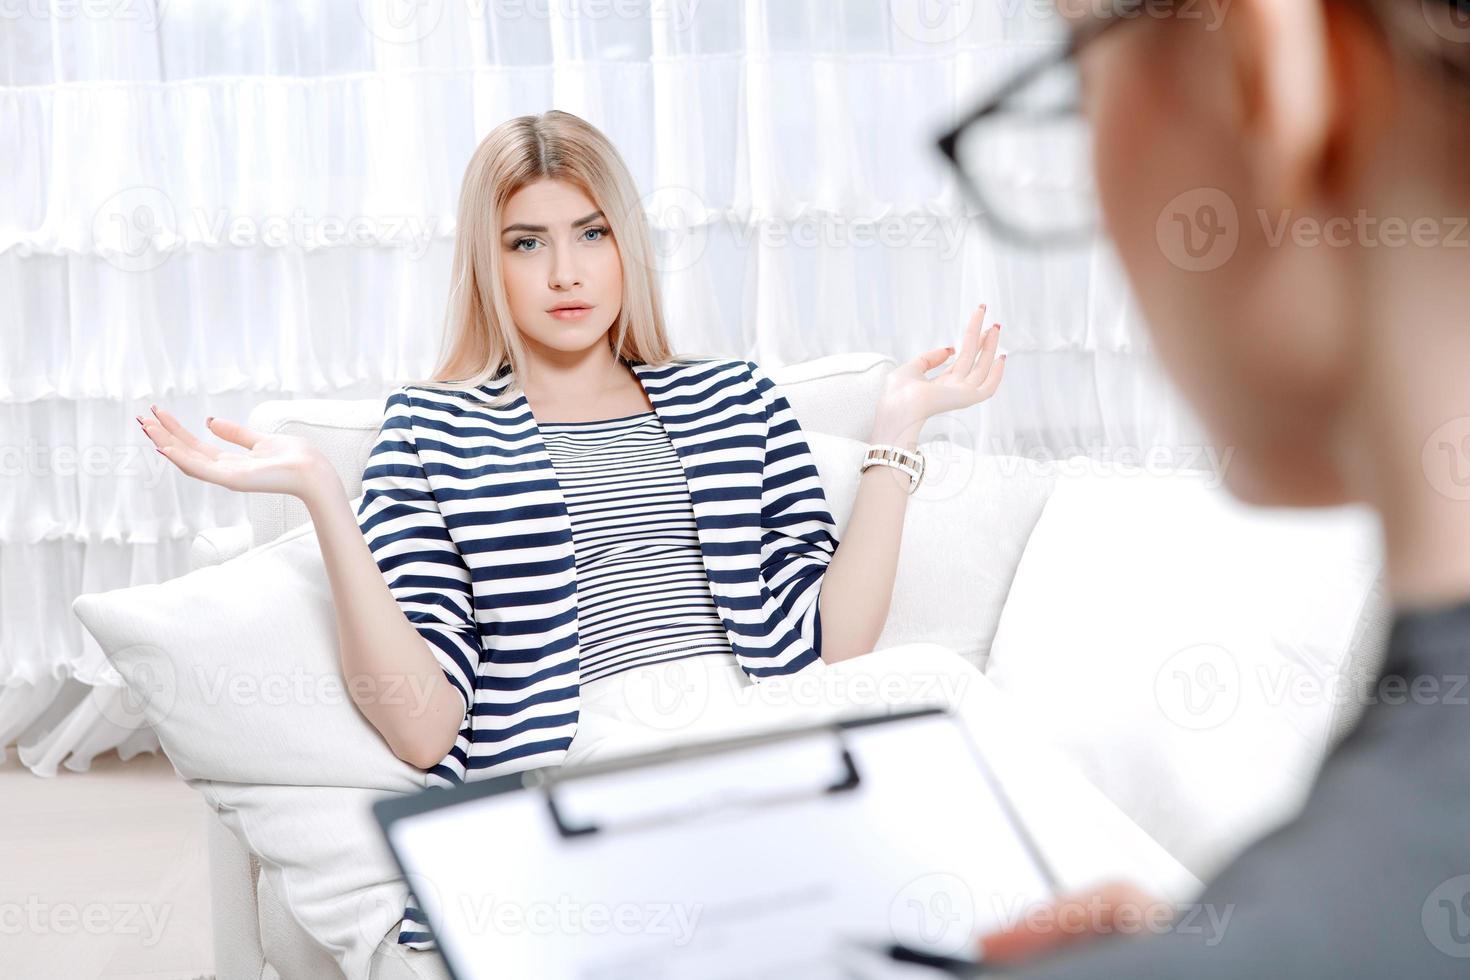 paciente na sessão de terapia psicológica foto